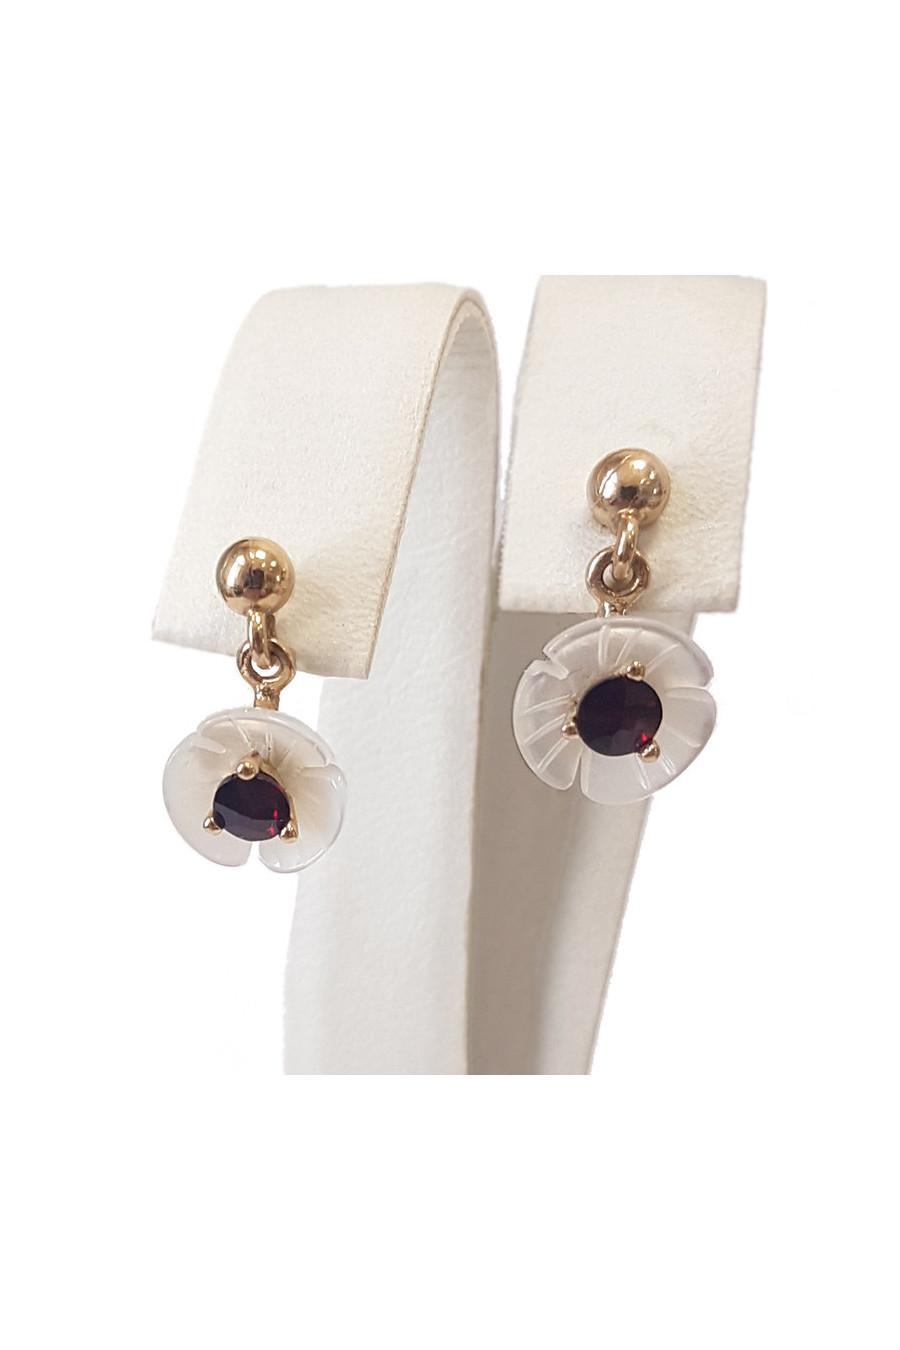 Gold earrings, garnet, mother of pearl